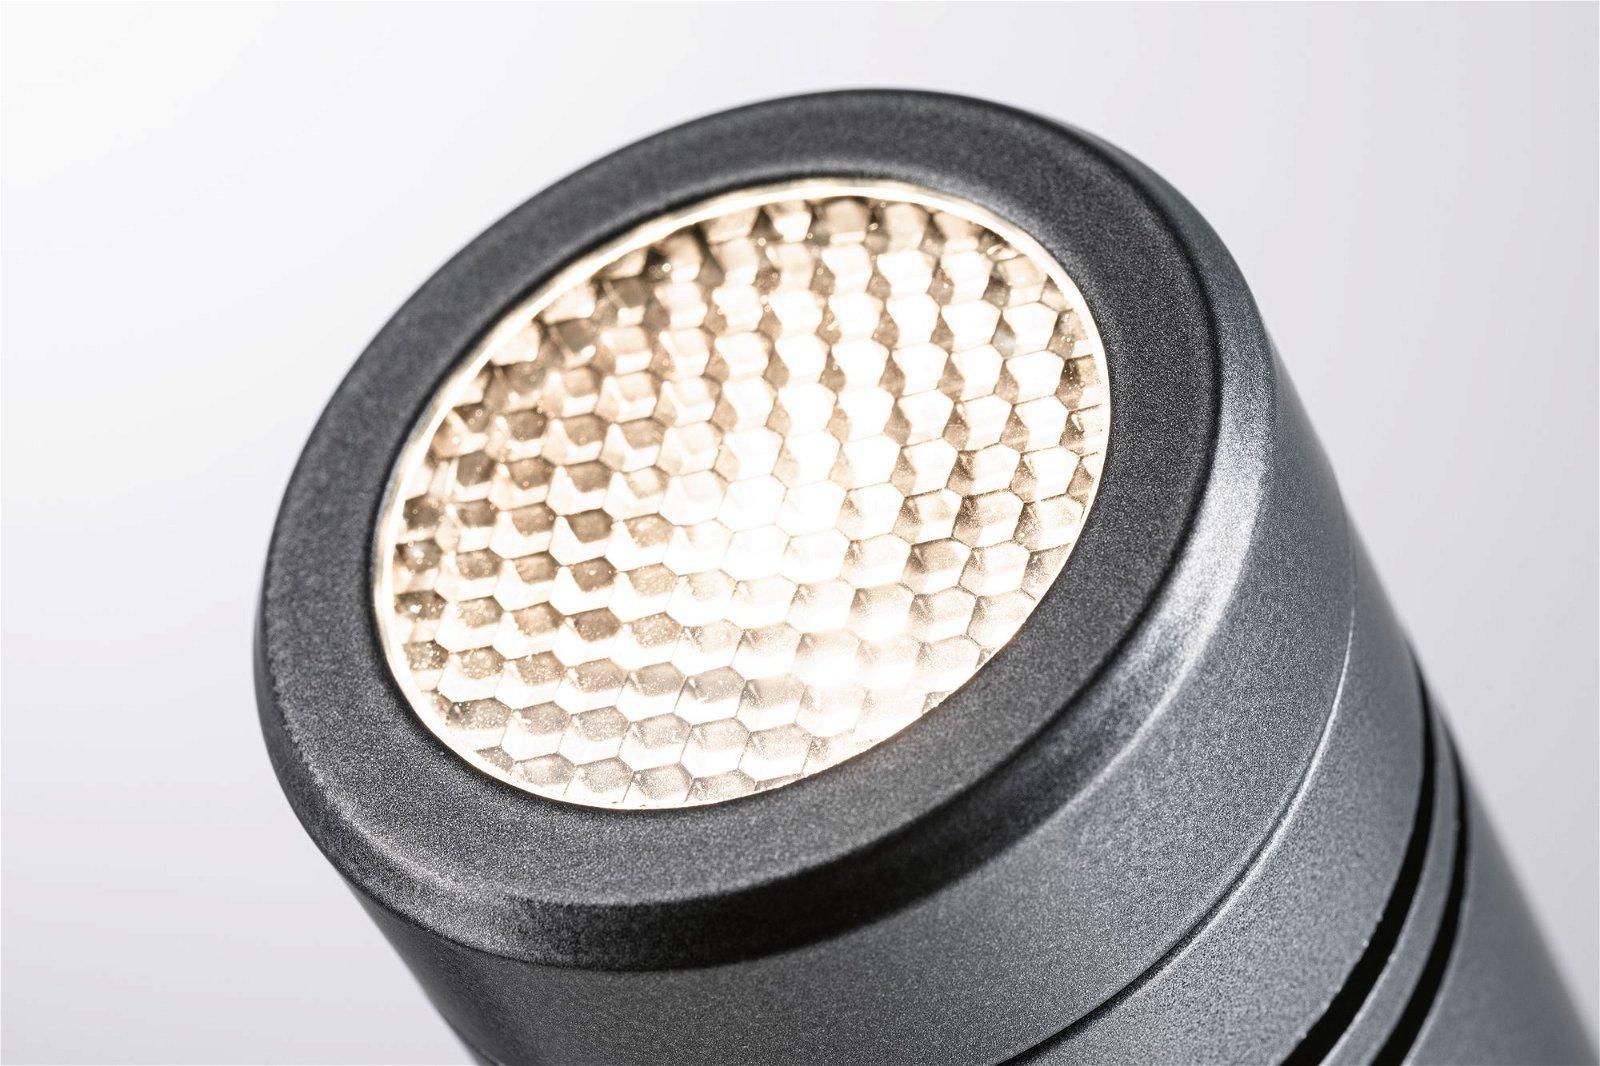 LED Gartenstrahler Radon IP65 55mm 3000K 11W 1200lm 230V Grau Aluminium